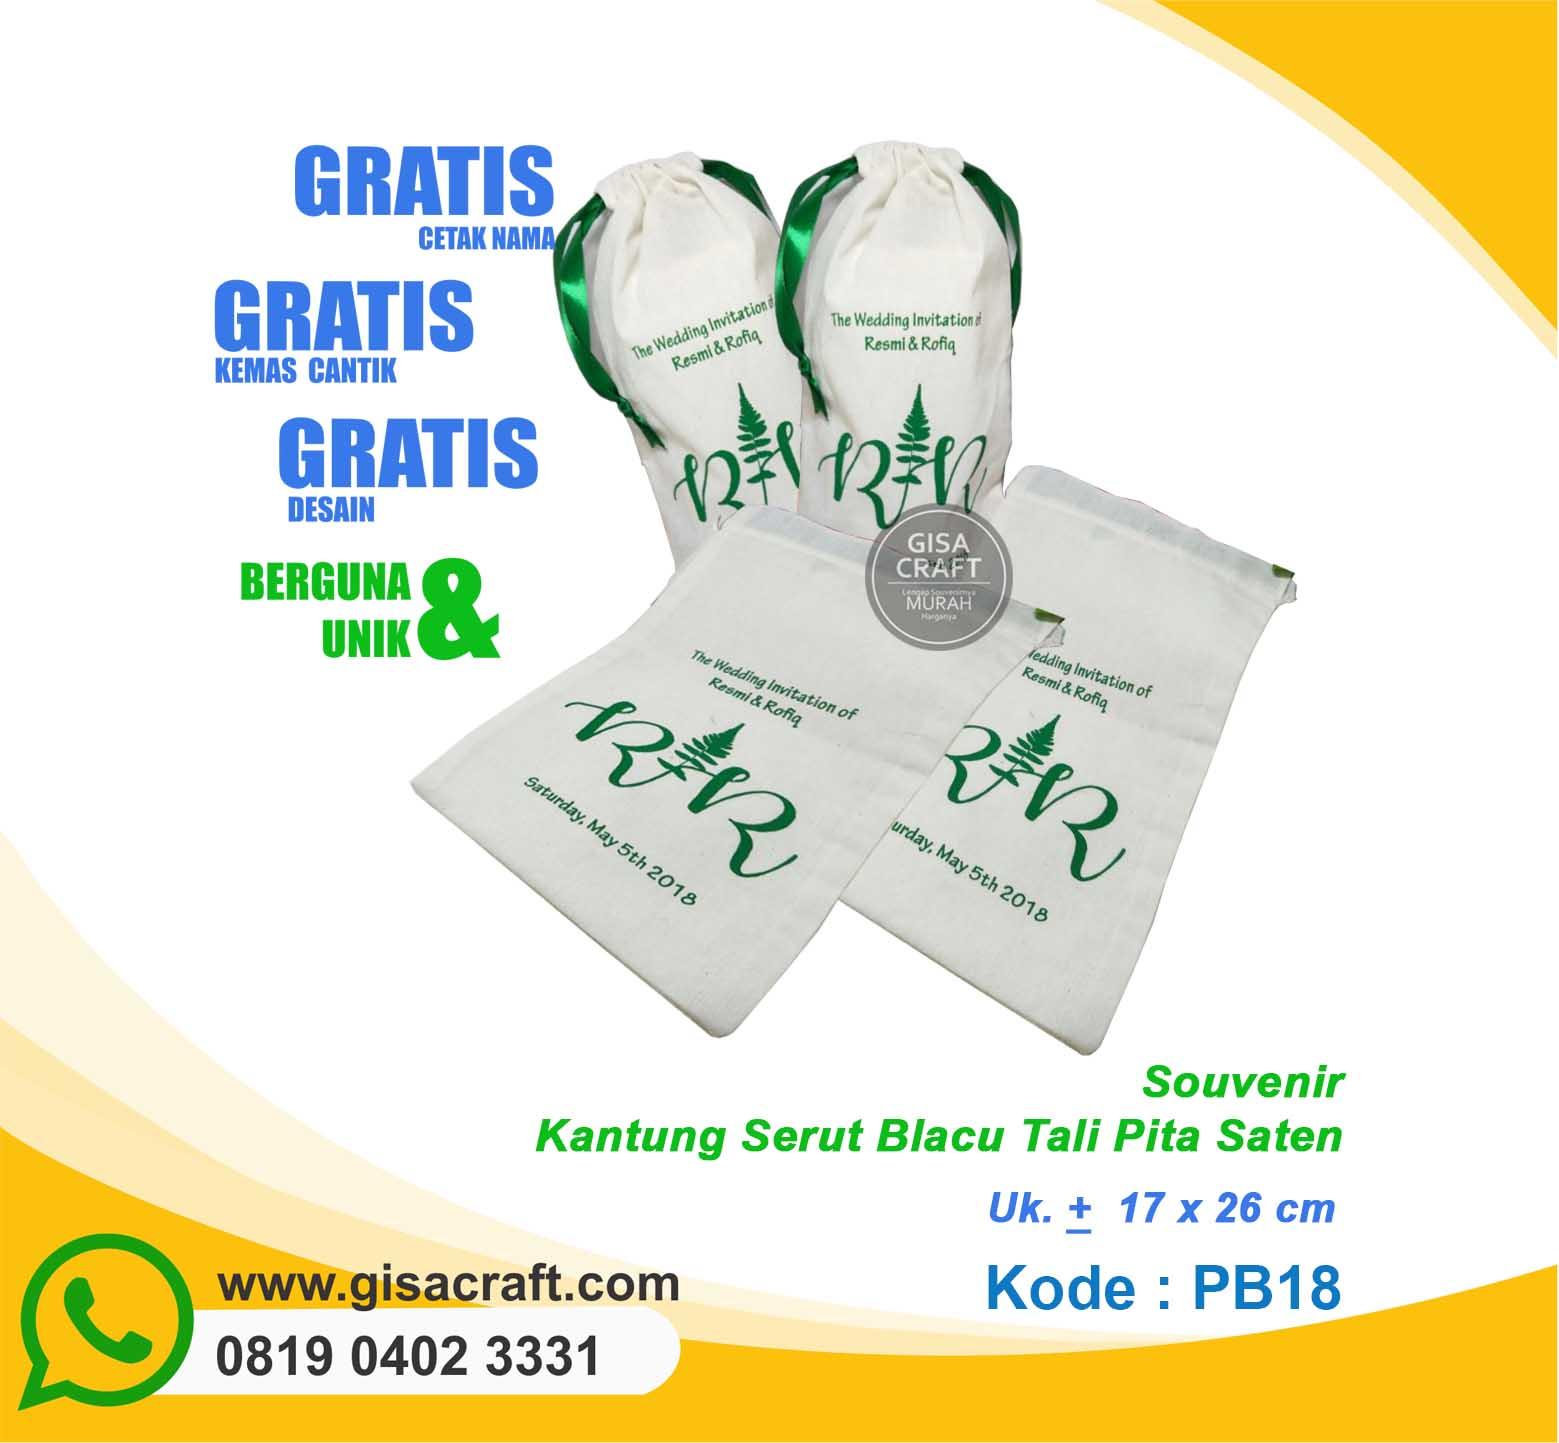 Souvenir Kantung Serut Belacu Tali Pita Saten PB18